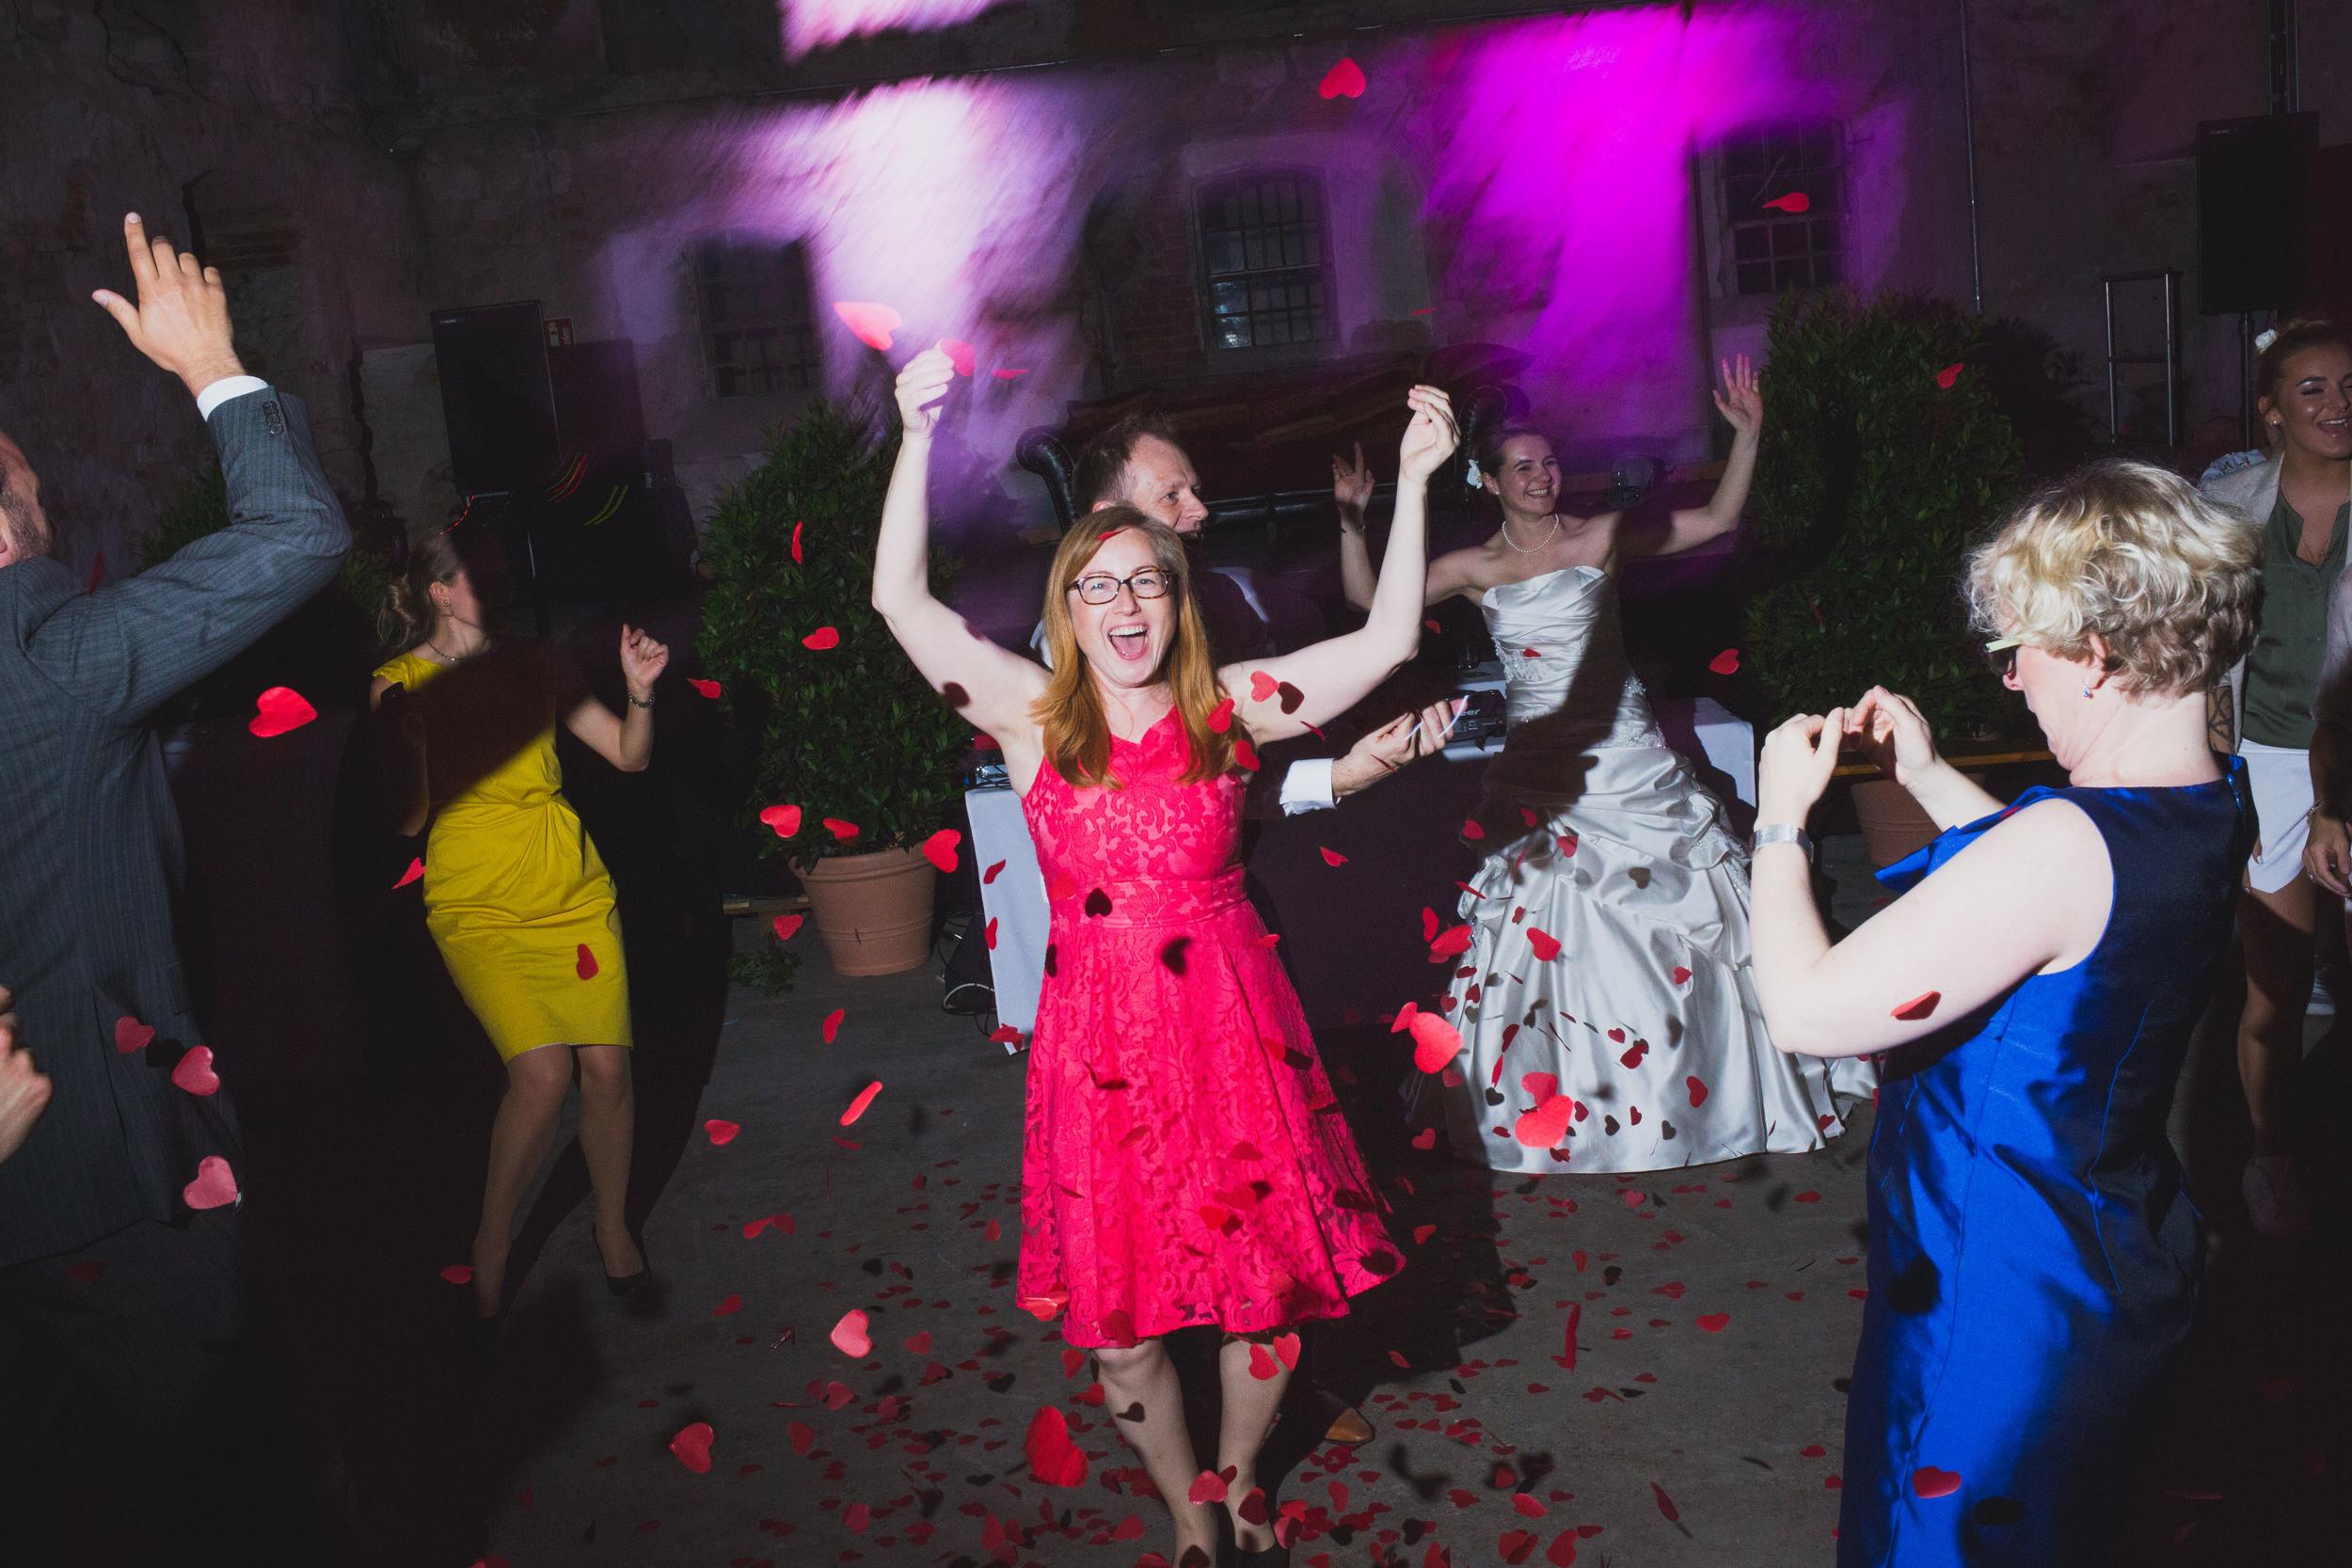 Pauline-Und-Christoph-Buffalo-NY-Wedding-by-Stefan-Ludwig-Photography-576.jpg